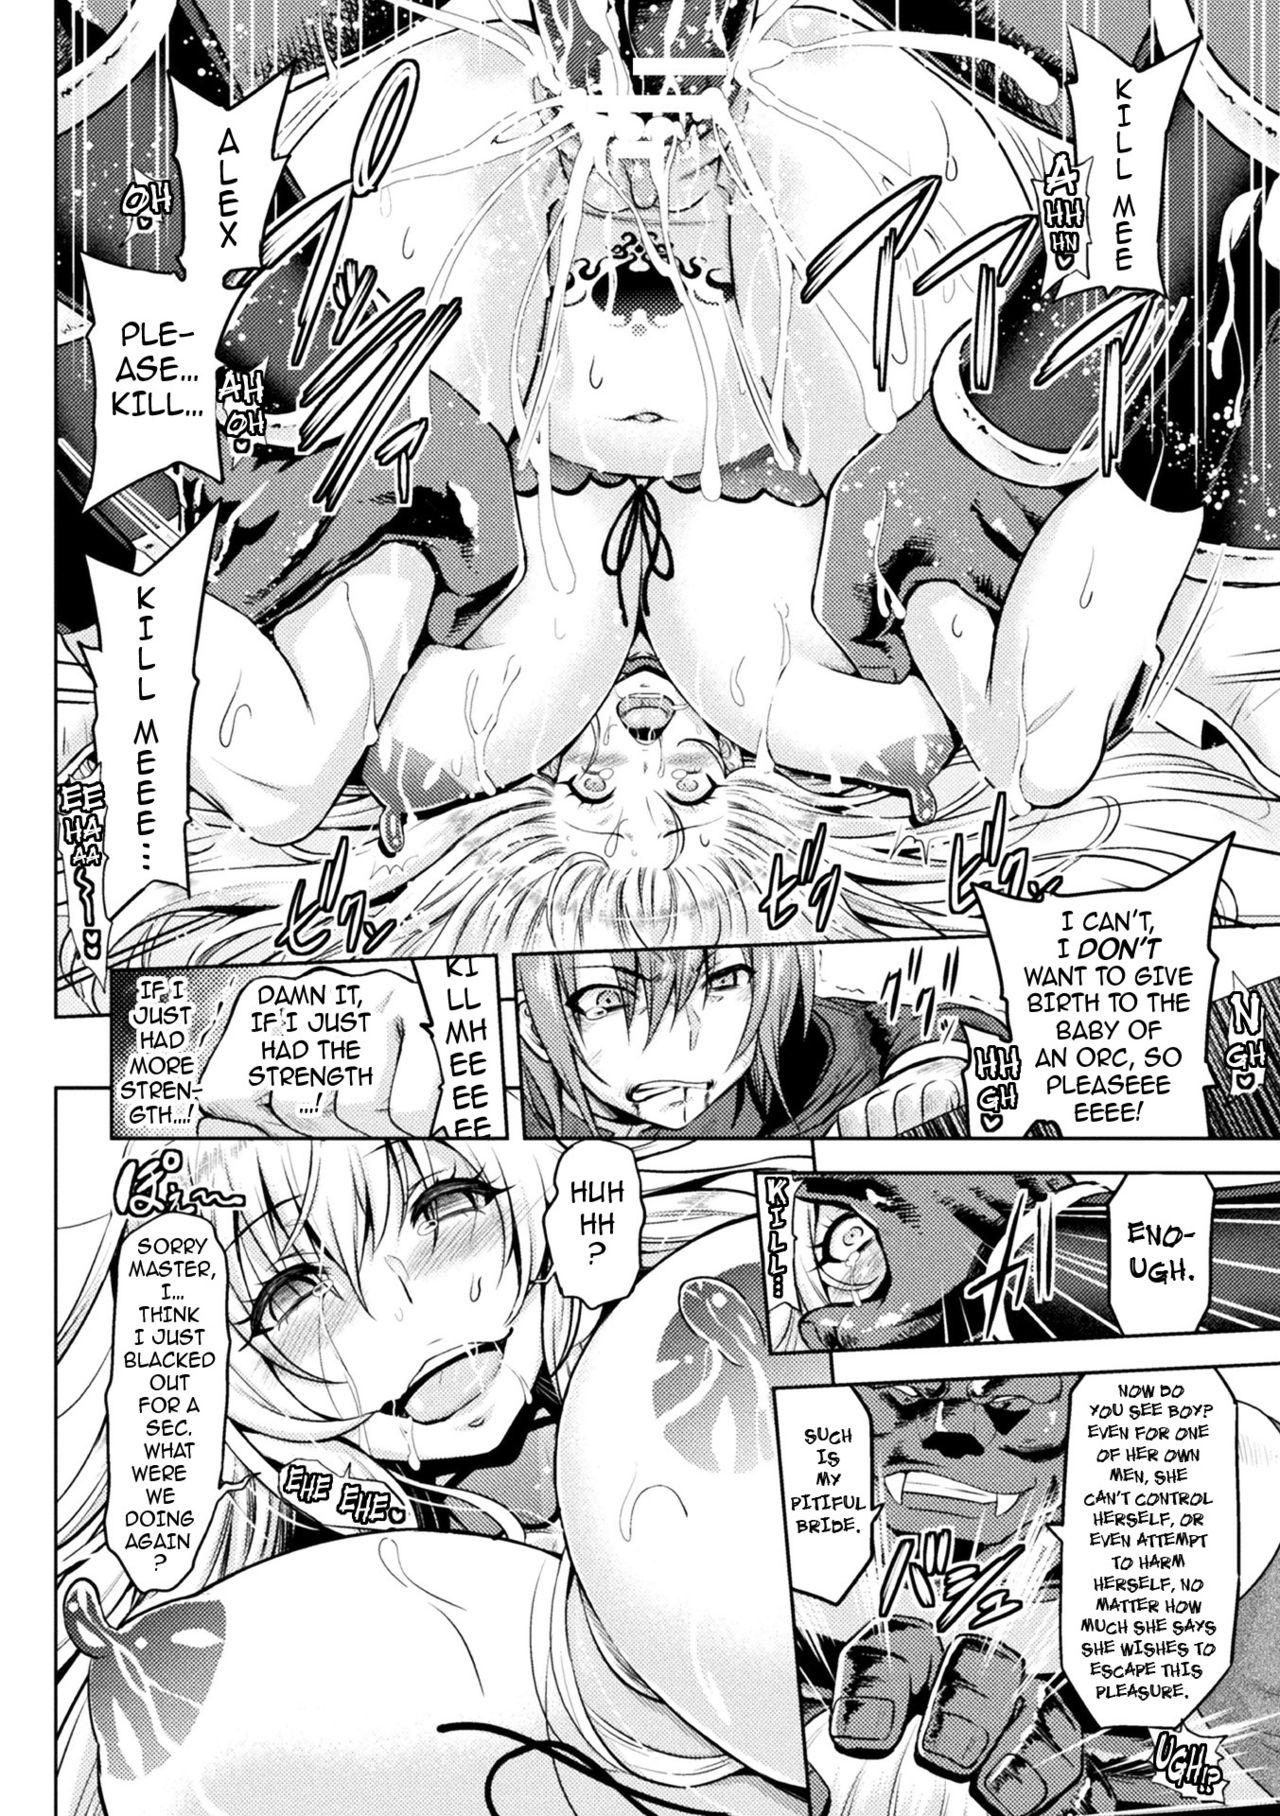 [Yamada Gogogo] Erona ~Orc no Inmon ni Okasareta Onna Kishi no Matsuro~ | Erona ~The Fall of a Beautiful Knight Cursed with the Lewd Mark of an Orc~ [English] {darknight} 122